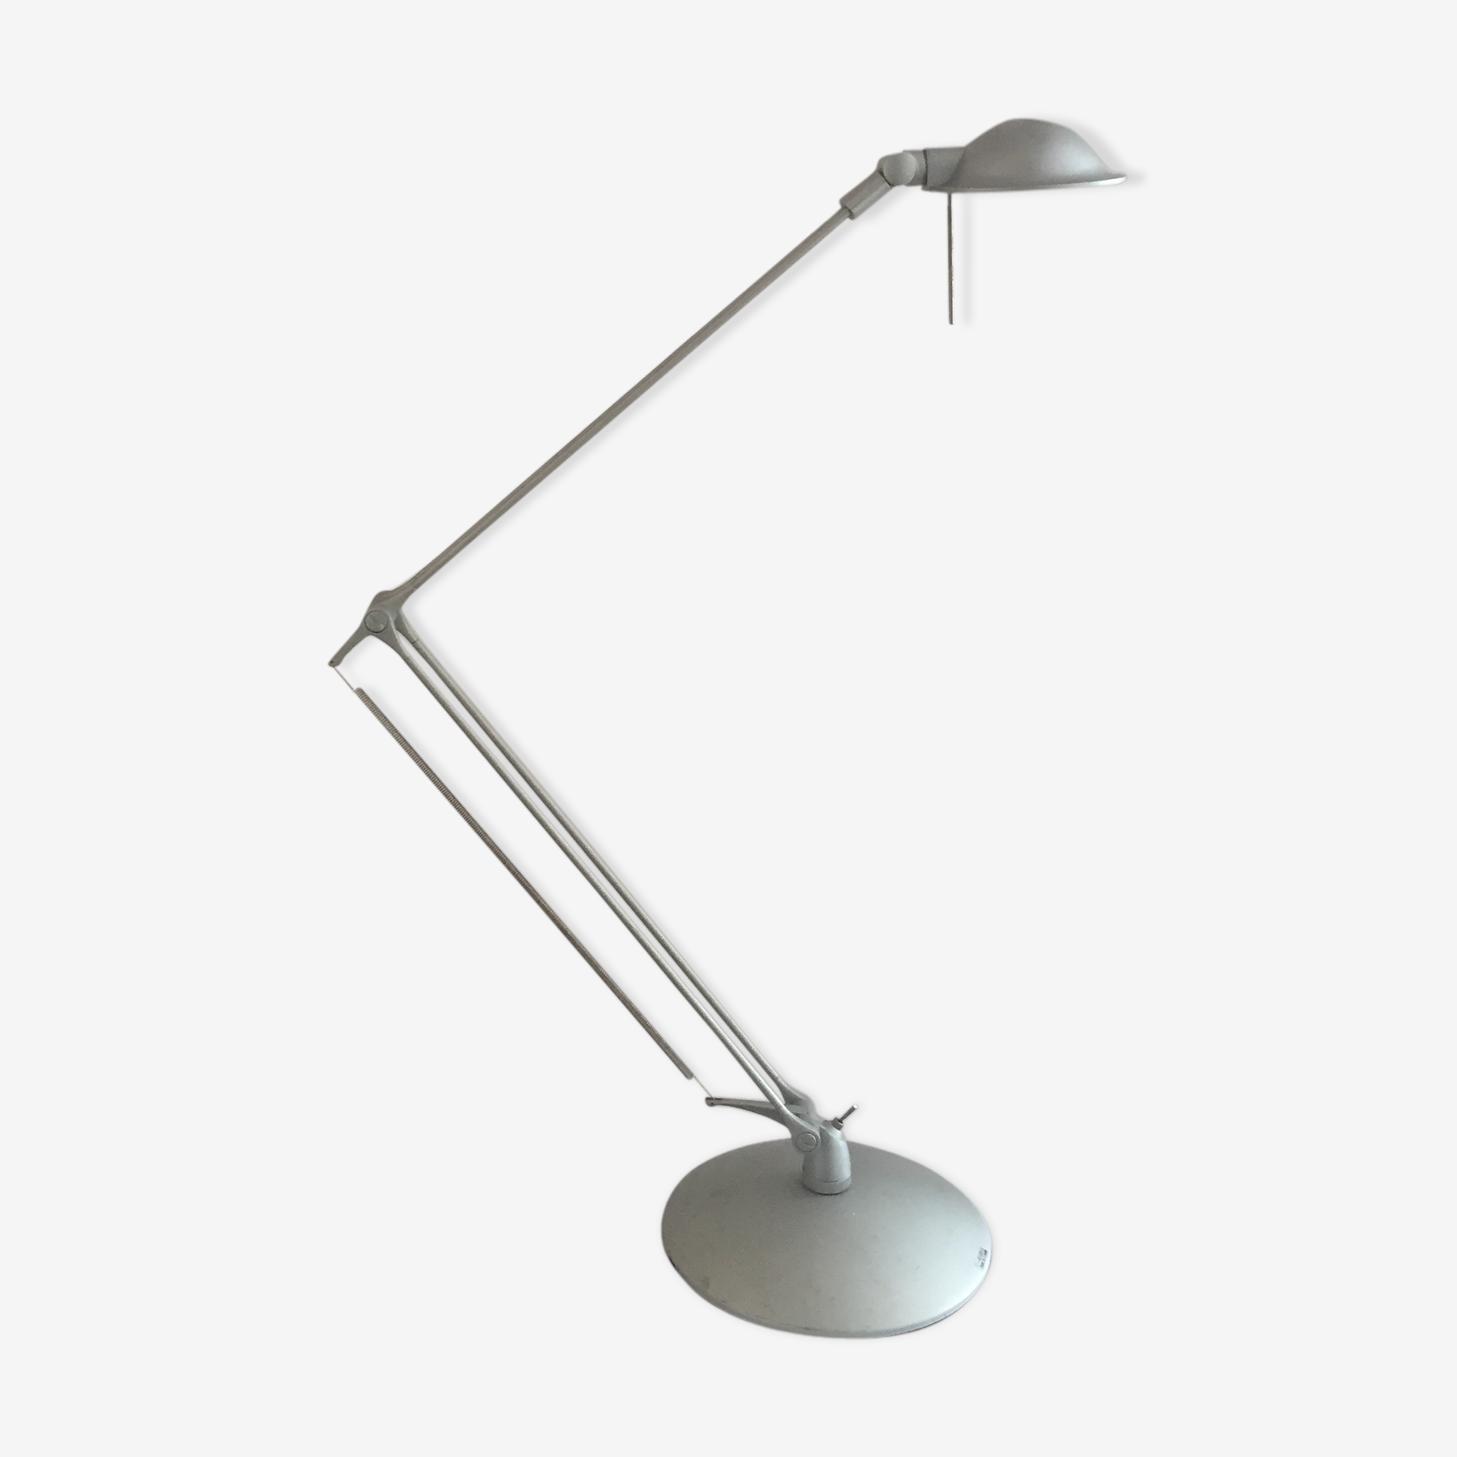 Articulated desk lamp